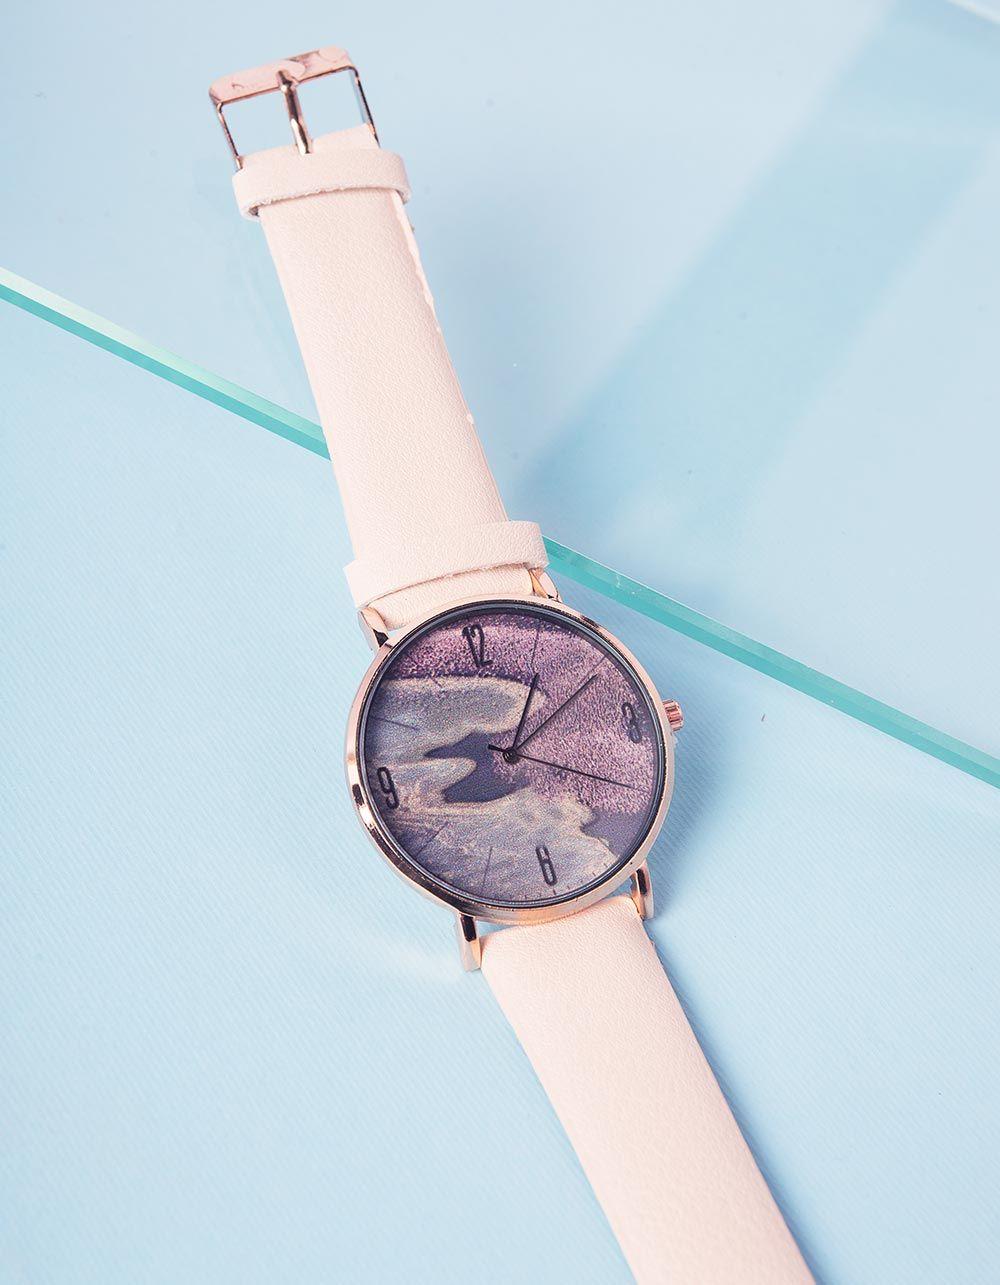 Годинник на руку з принтом хвиль | 237254-22-XX